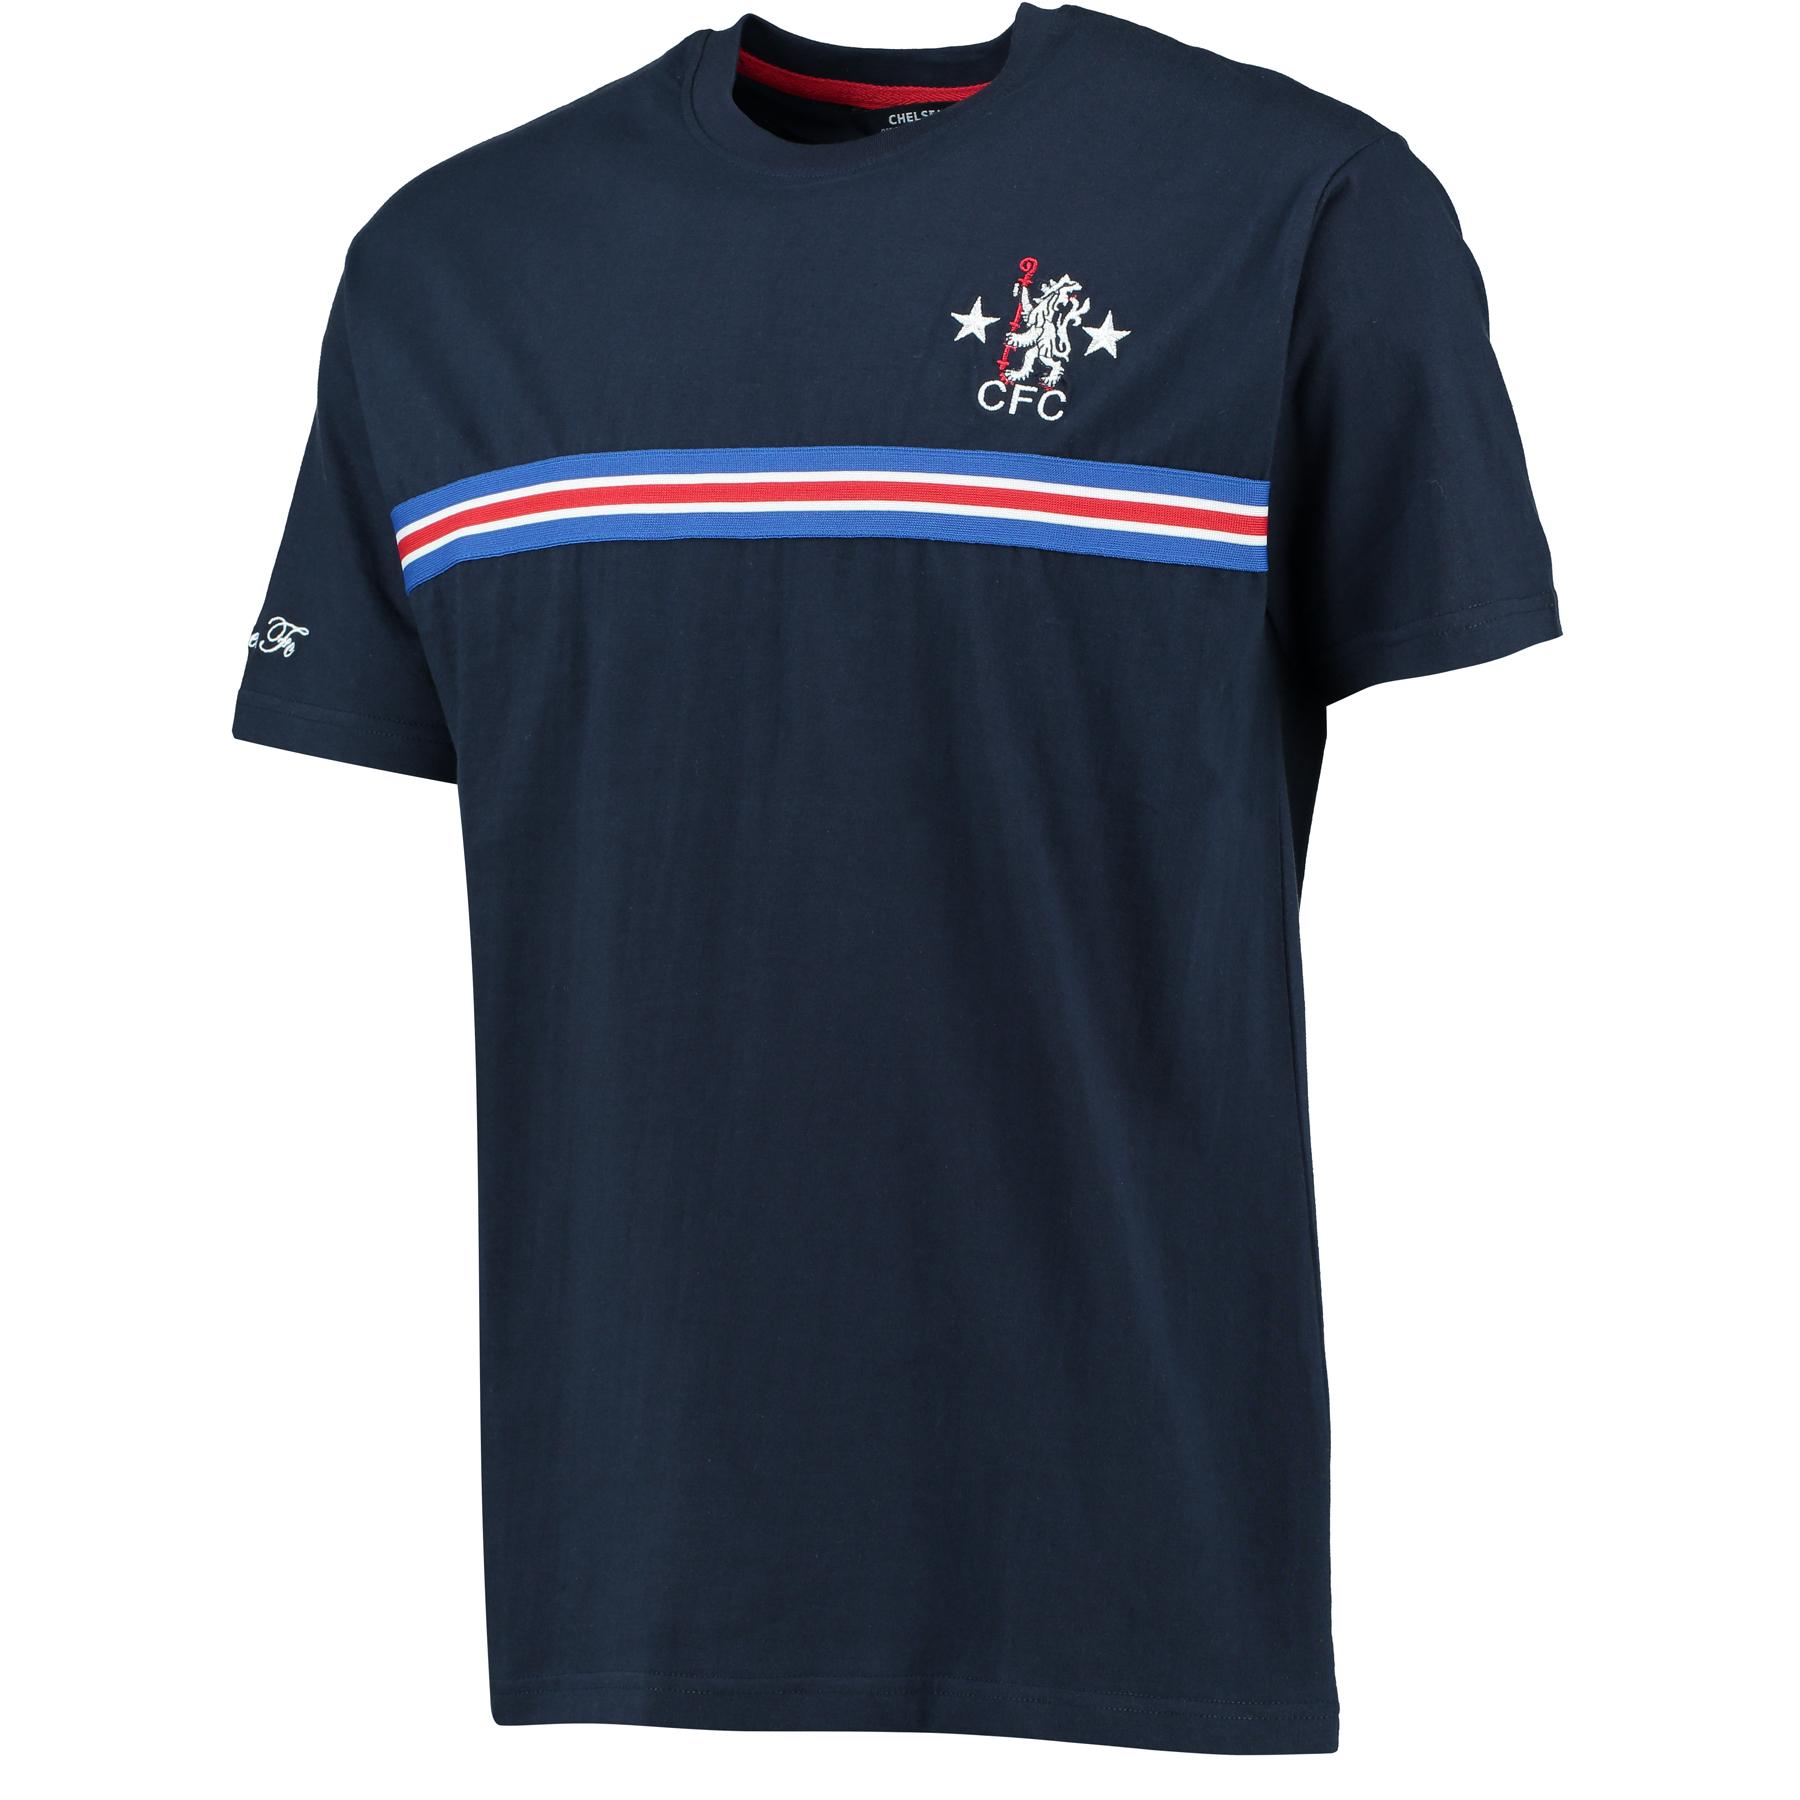 Chelsea Retro Tape T-Shirt - Navy - Mens